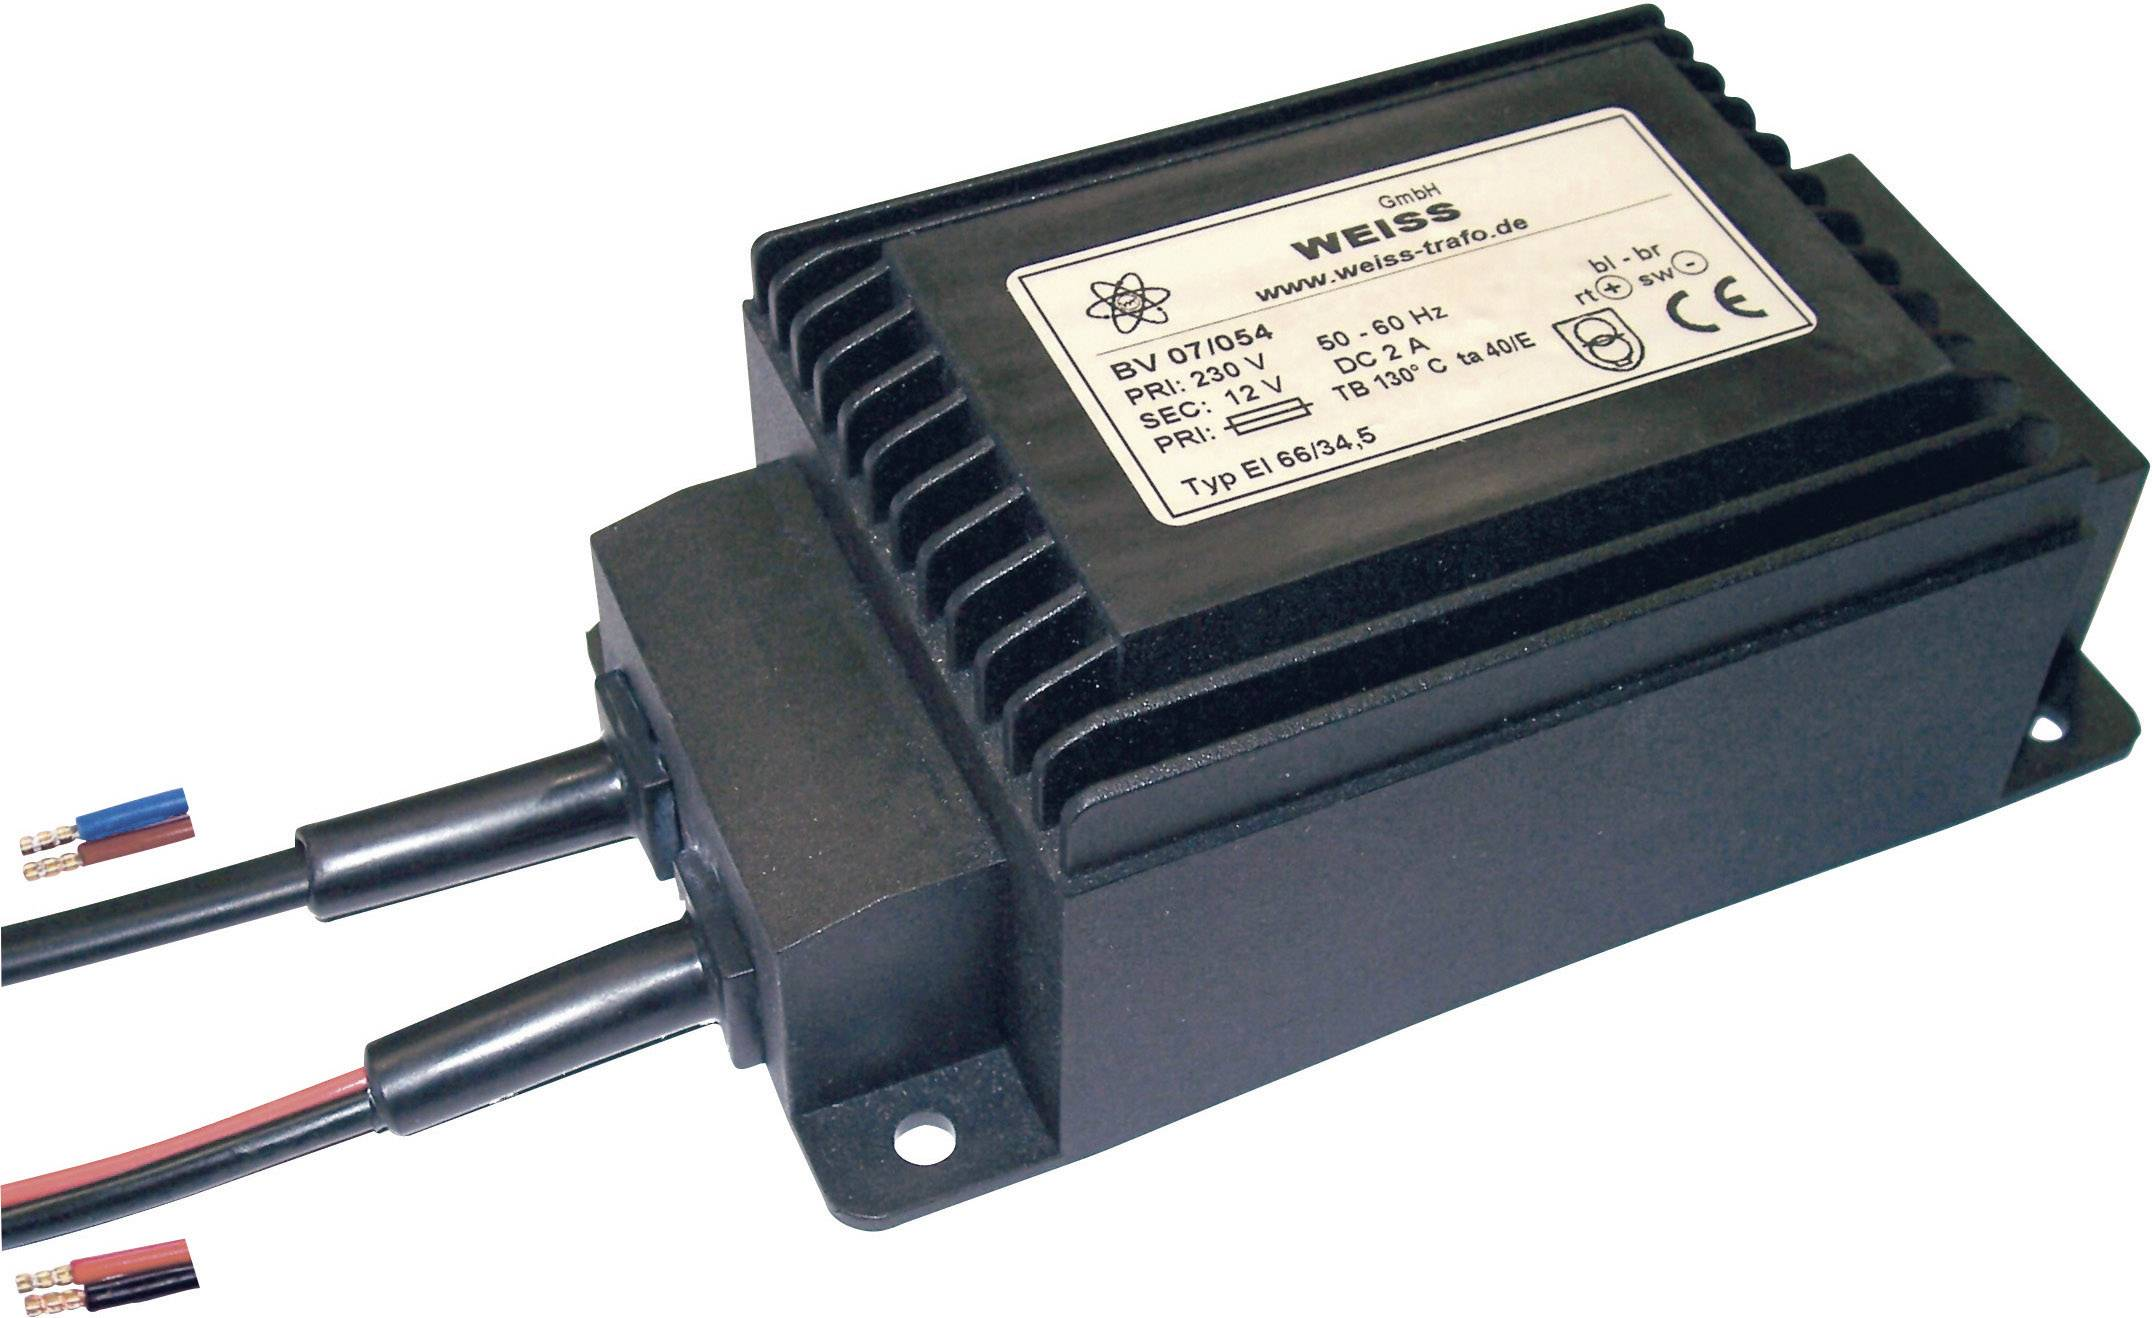 Kompaktný transformátor Weiss Elektrotechnik 07/056, 60 W